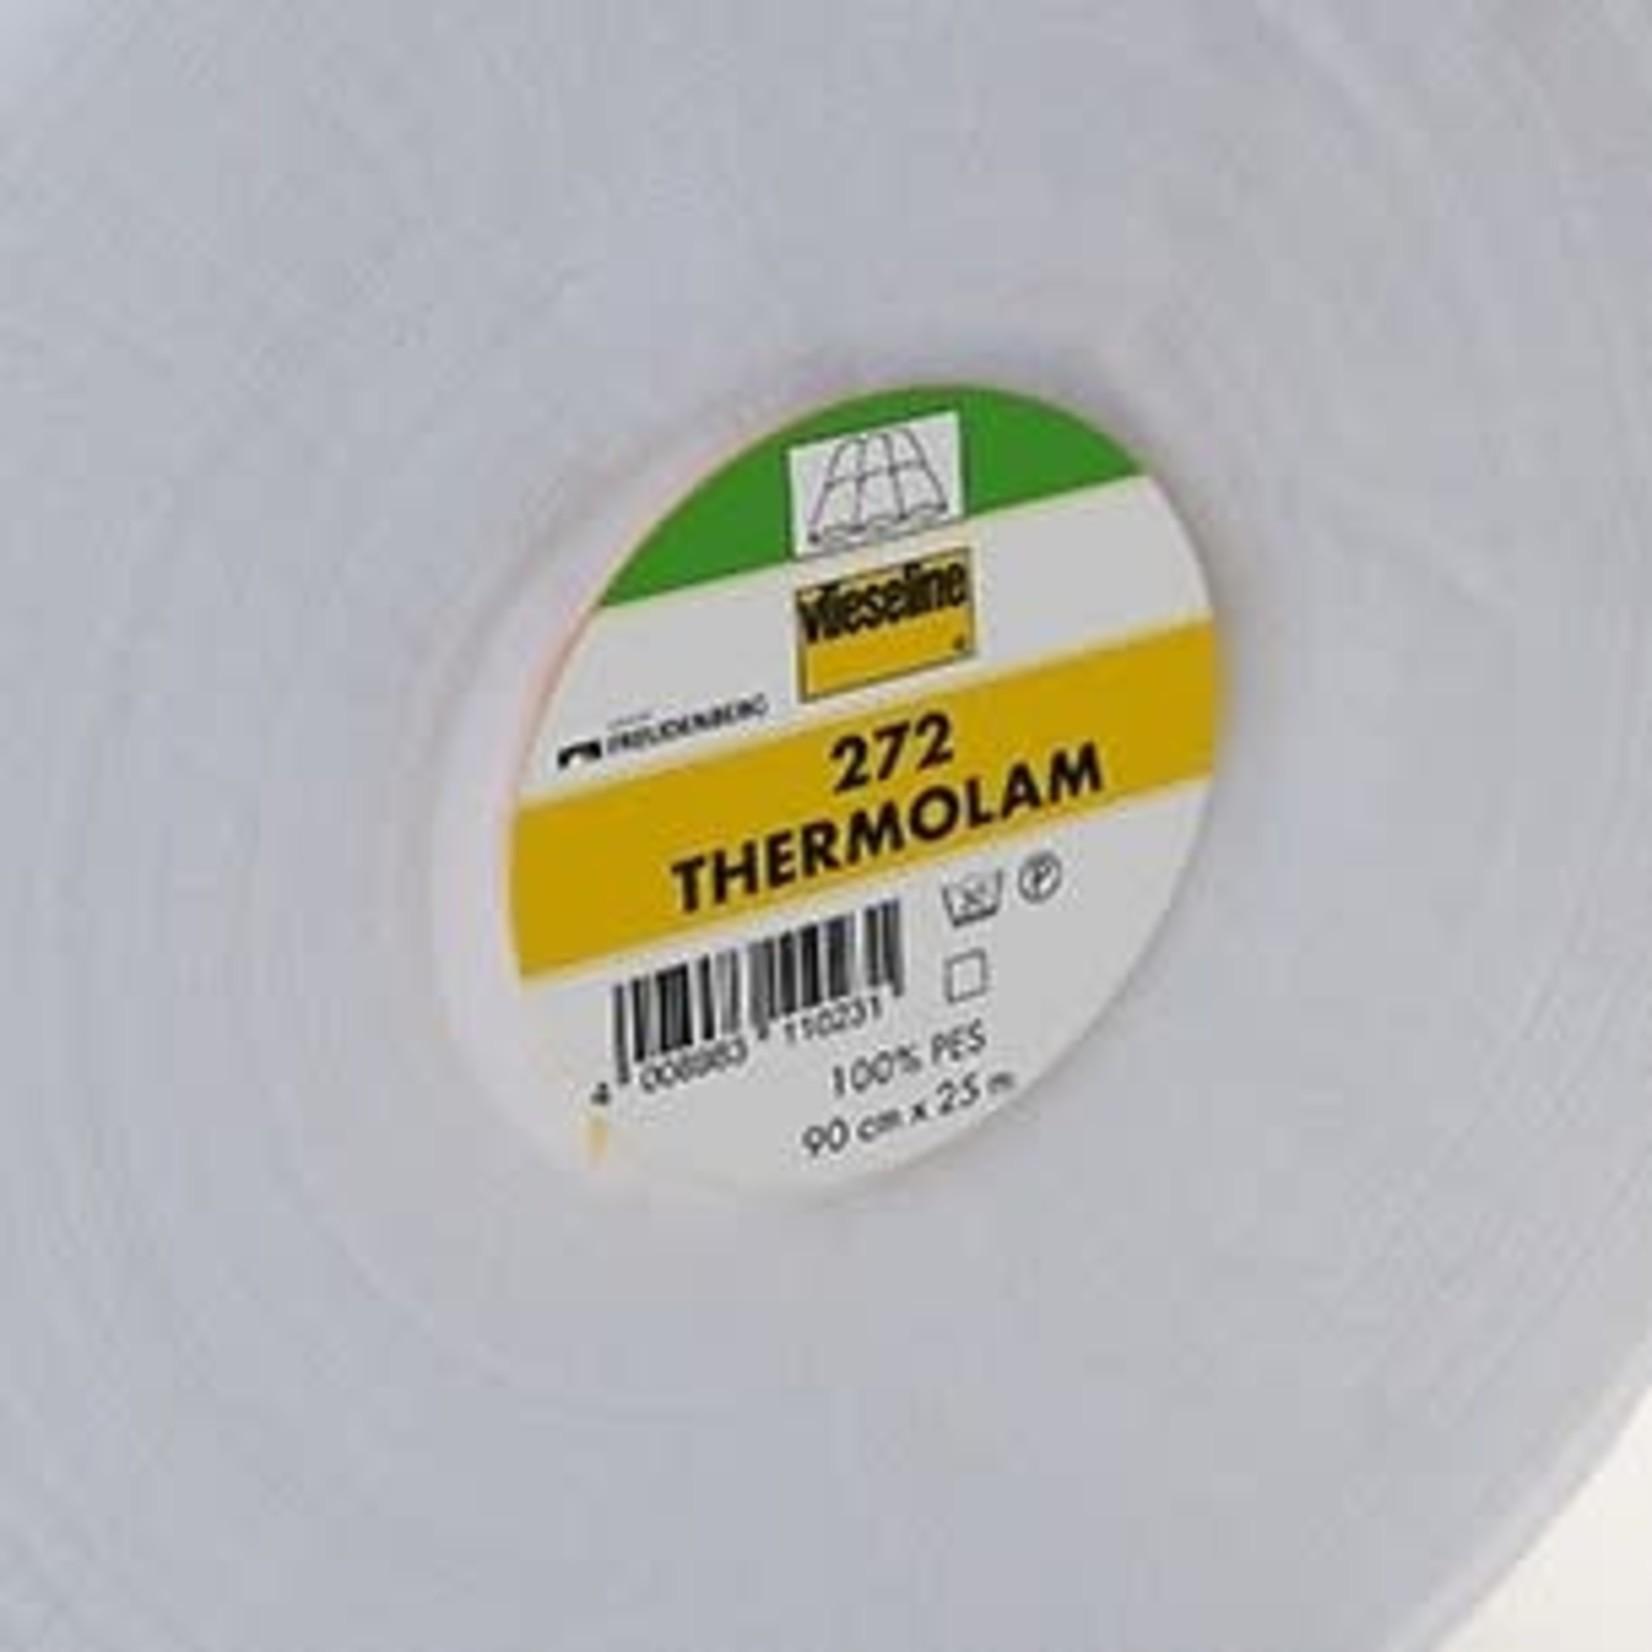 Vlieseline Polyester  - 272 Thermolam  - Van de rol (per 10 cm) 90 cm breed